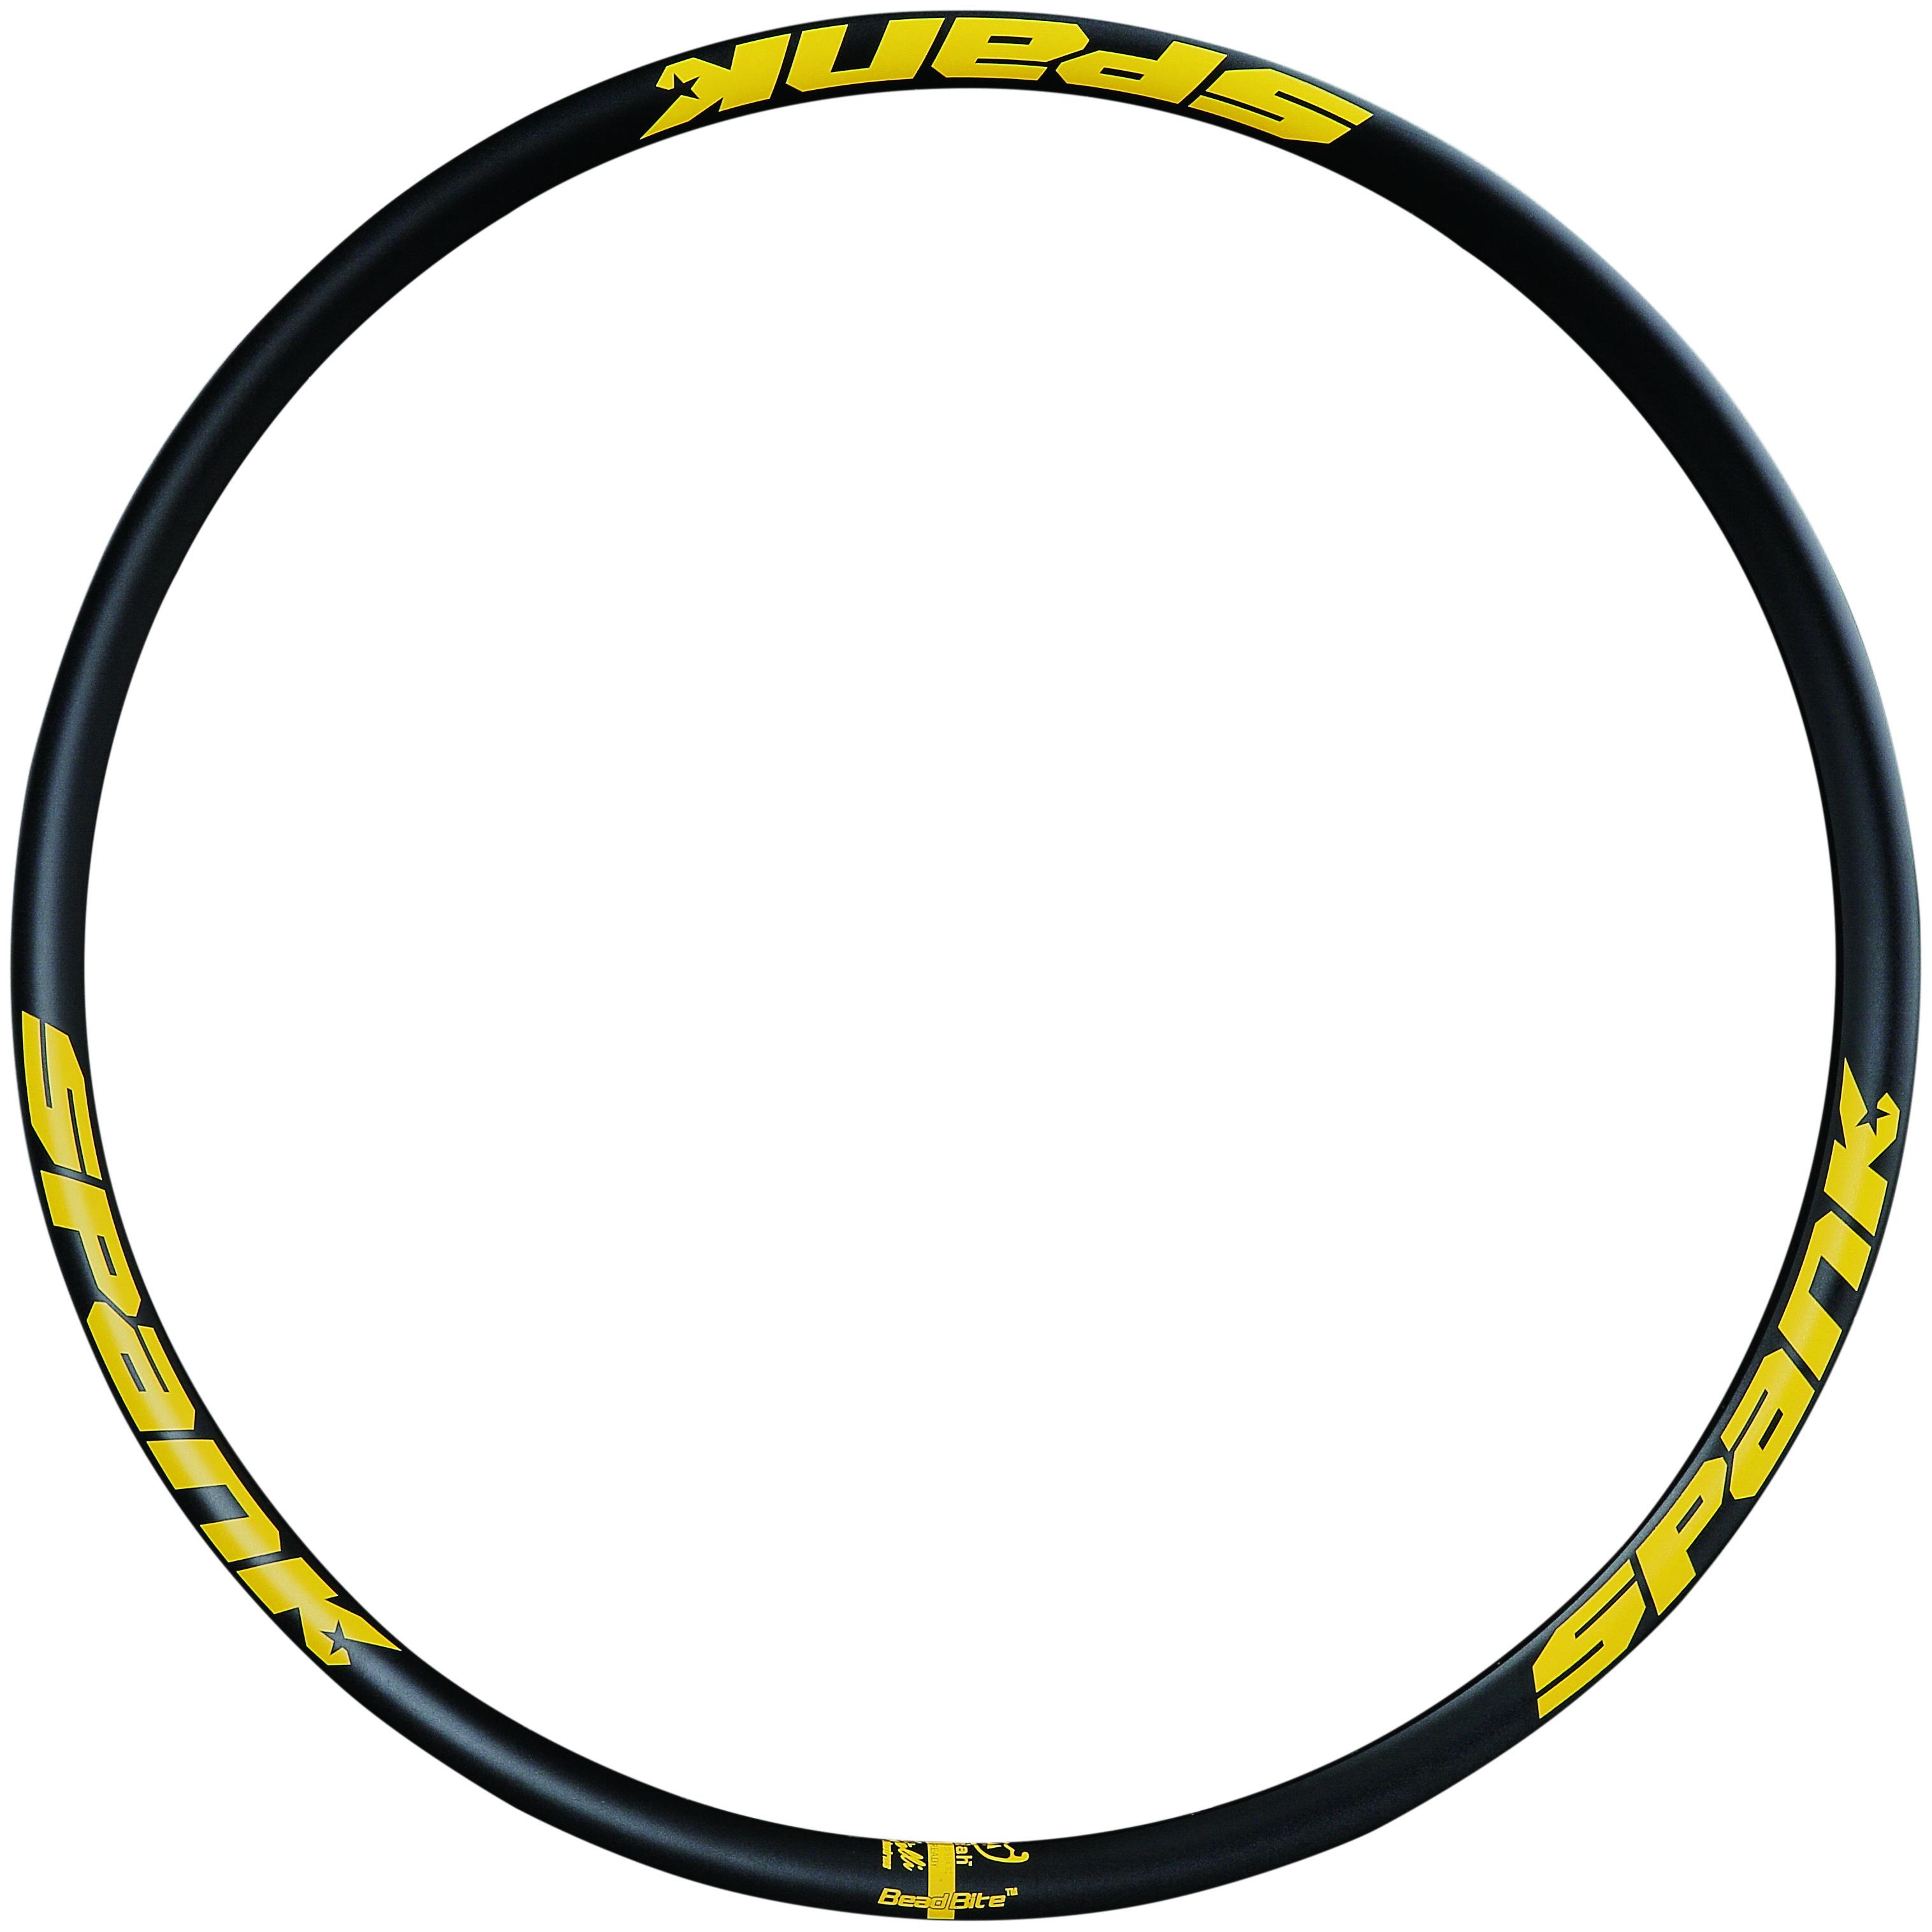 "SPANK Spike Race 33 ráfek, 26"" černý/žlutý, 32d"